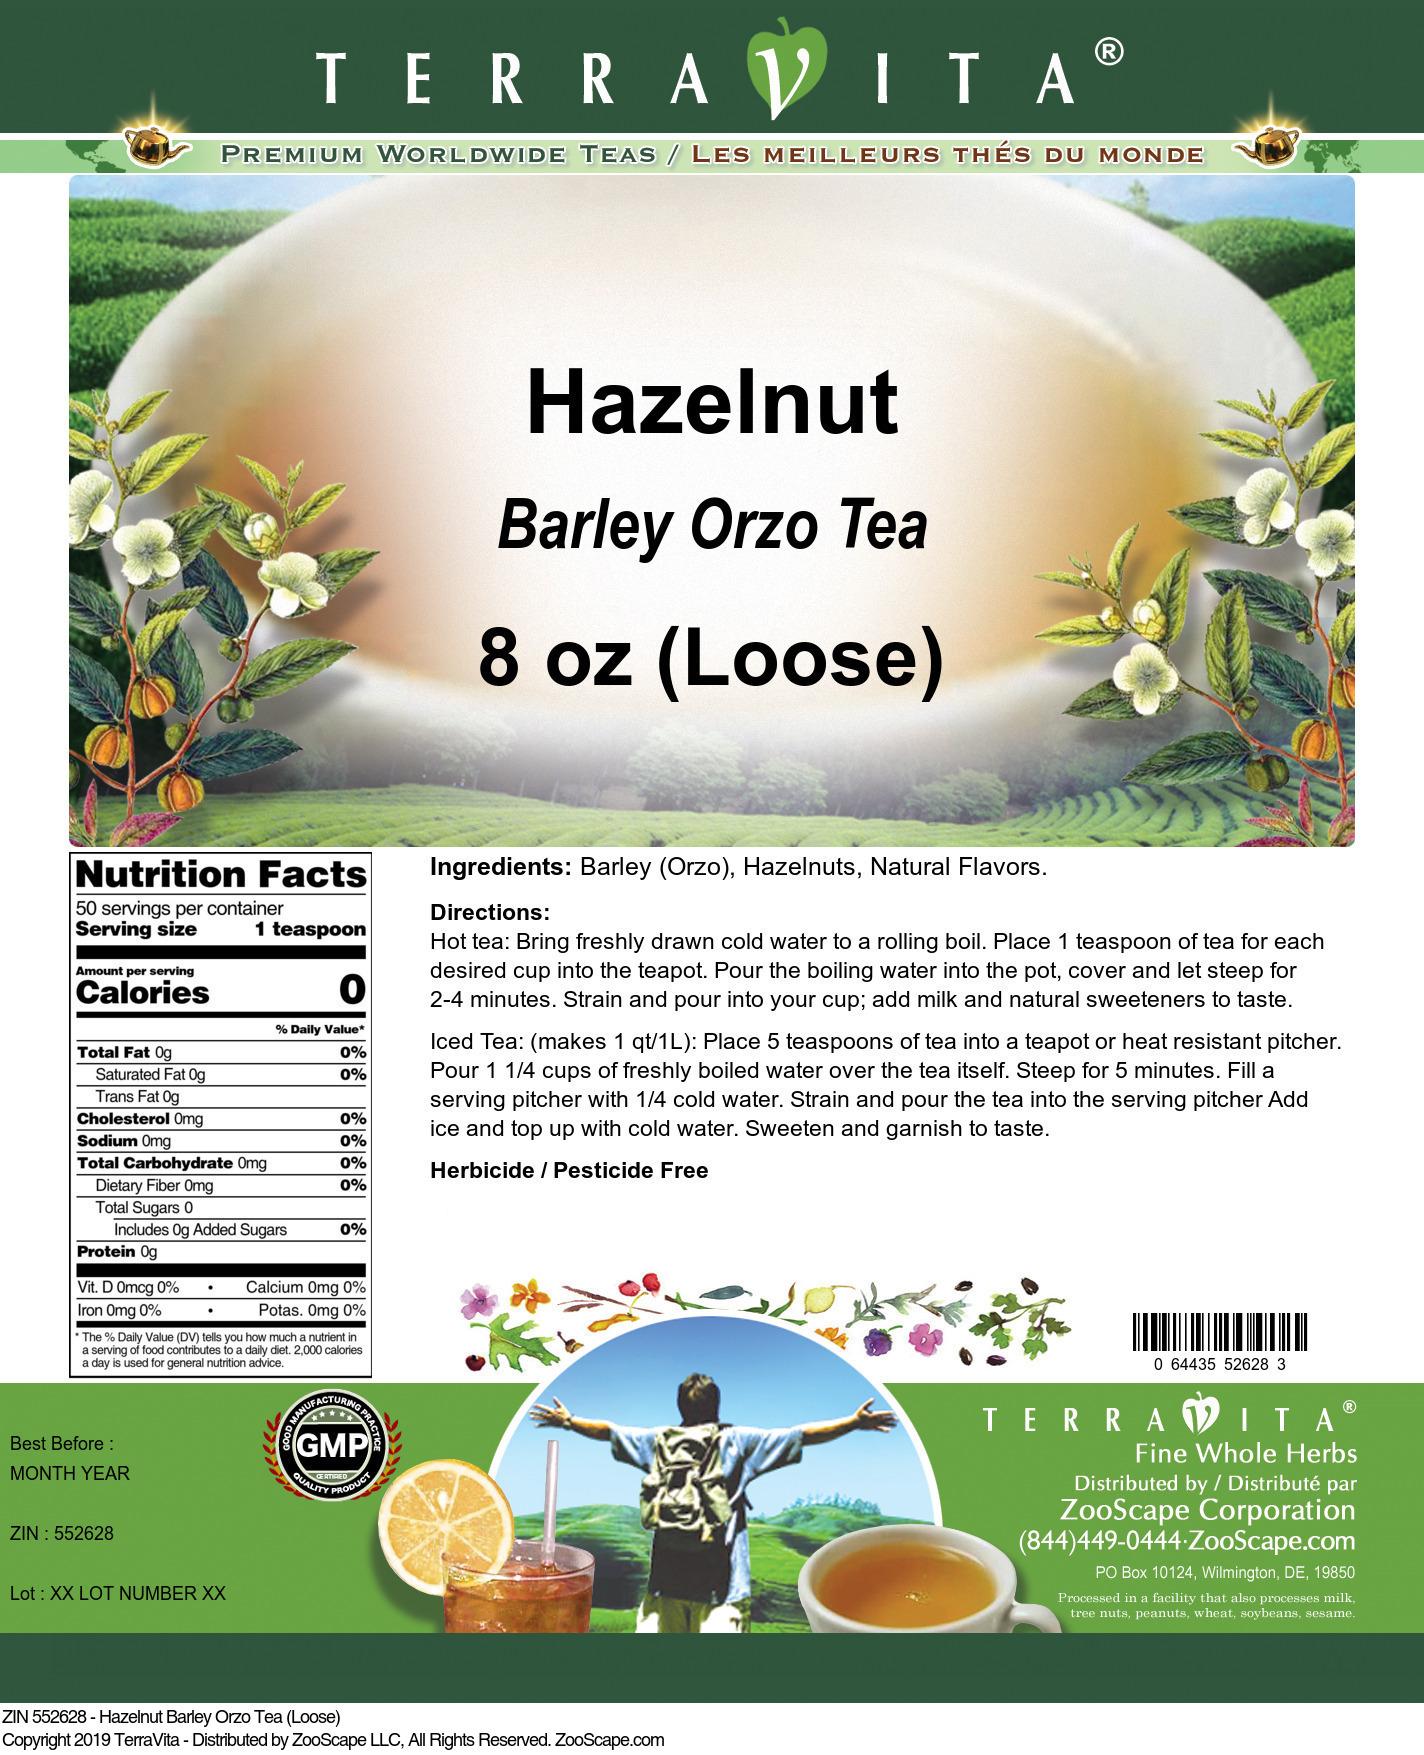 Hazelnut Barley Orzo Tea (Loose)